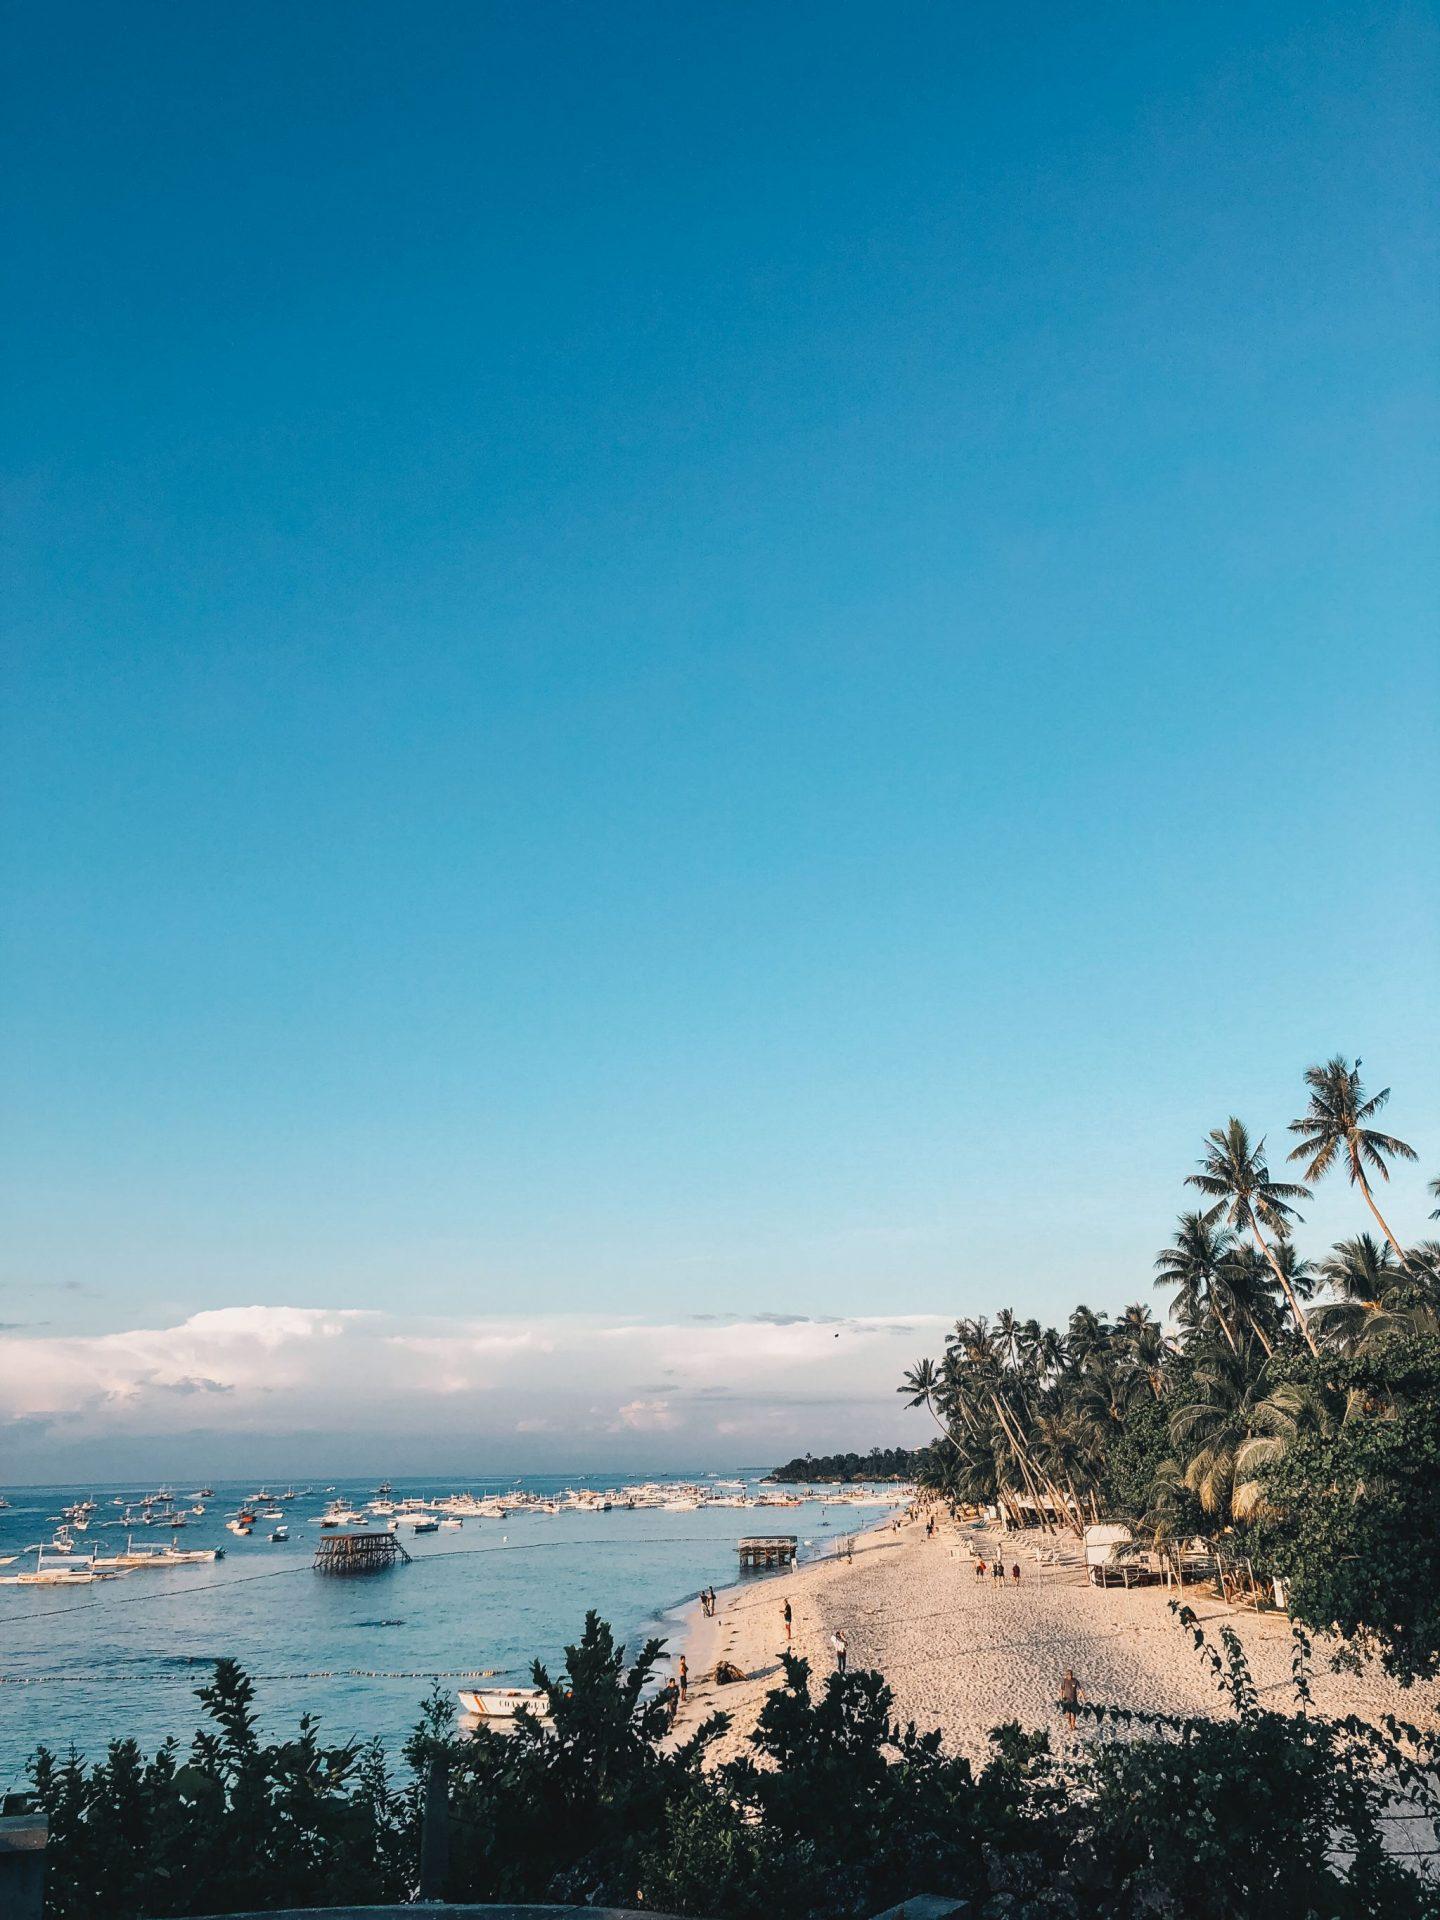 alona_beach_lemonaidlies